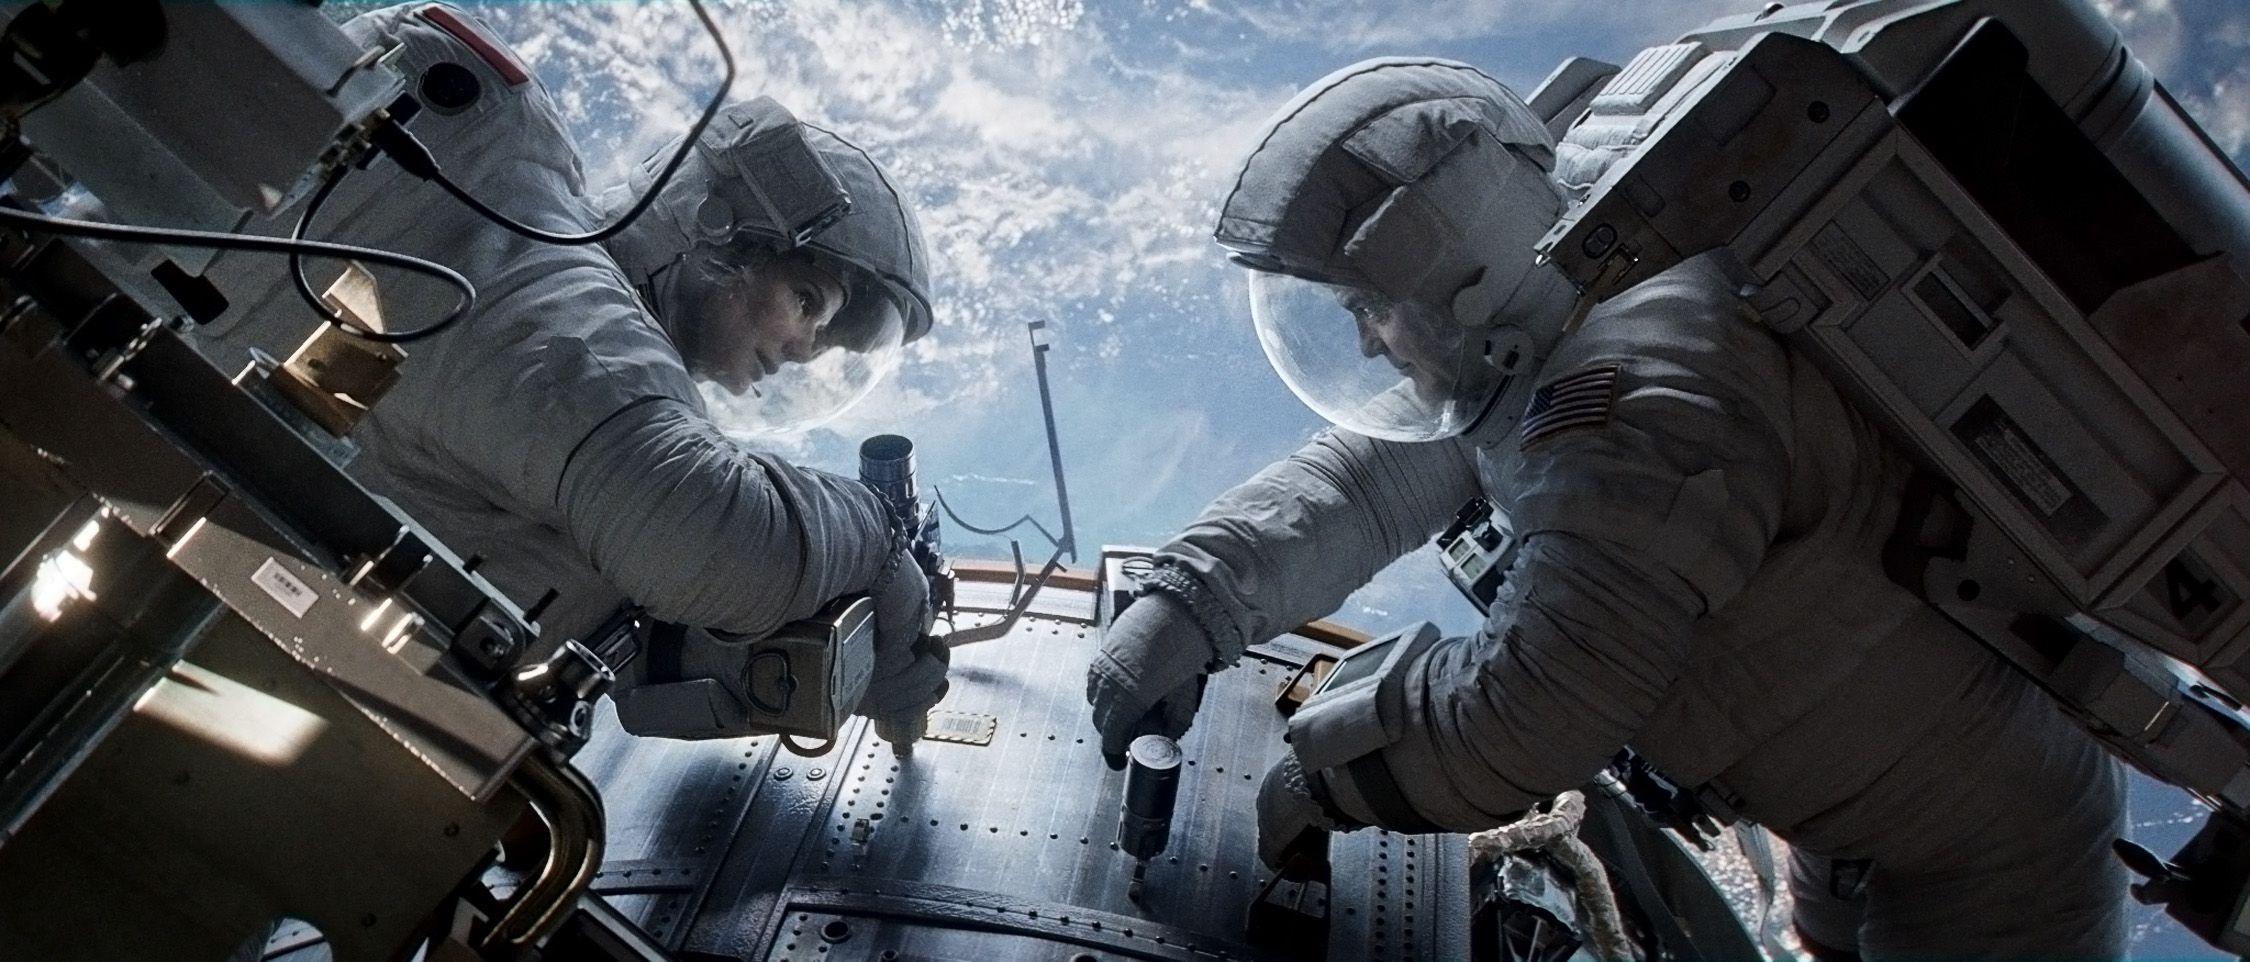 gravity | film review | slant magazine